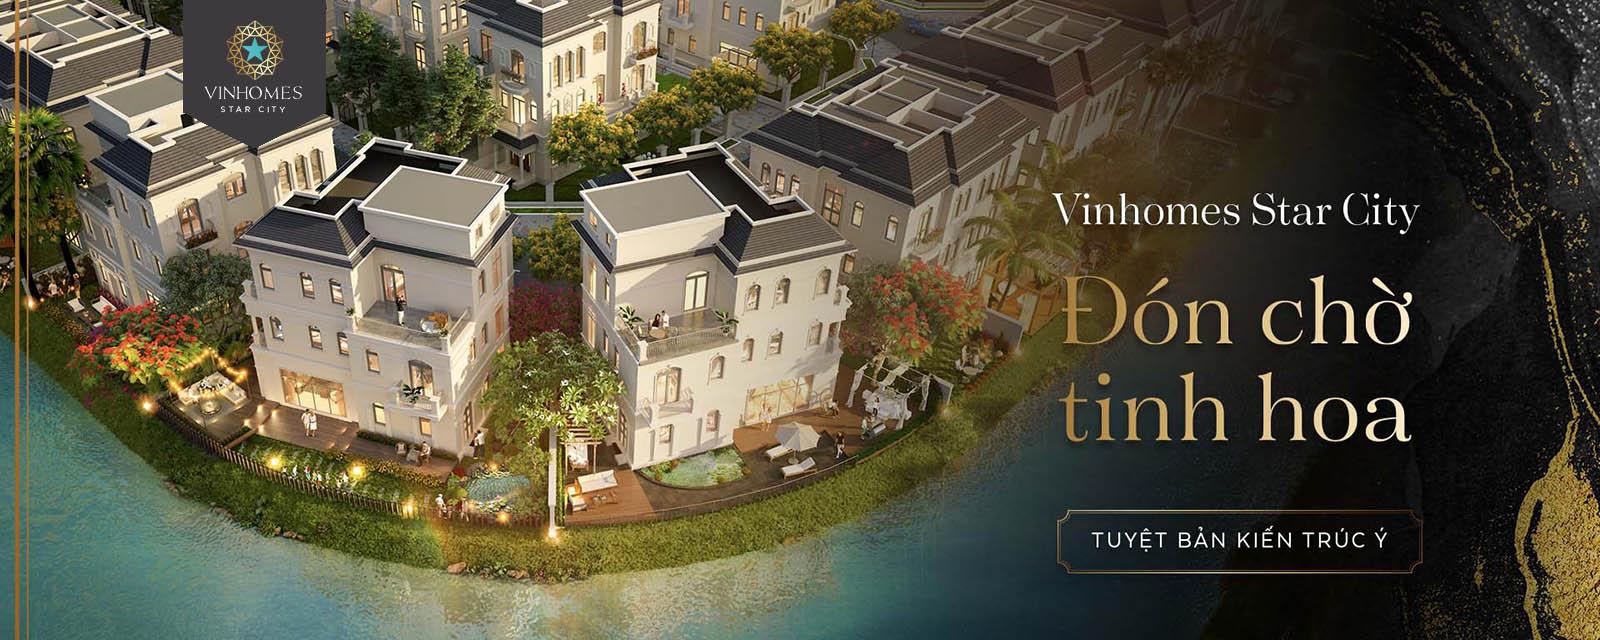 vinhomes-star-city-slide